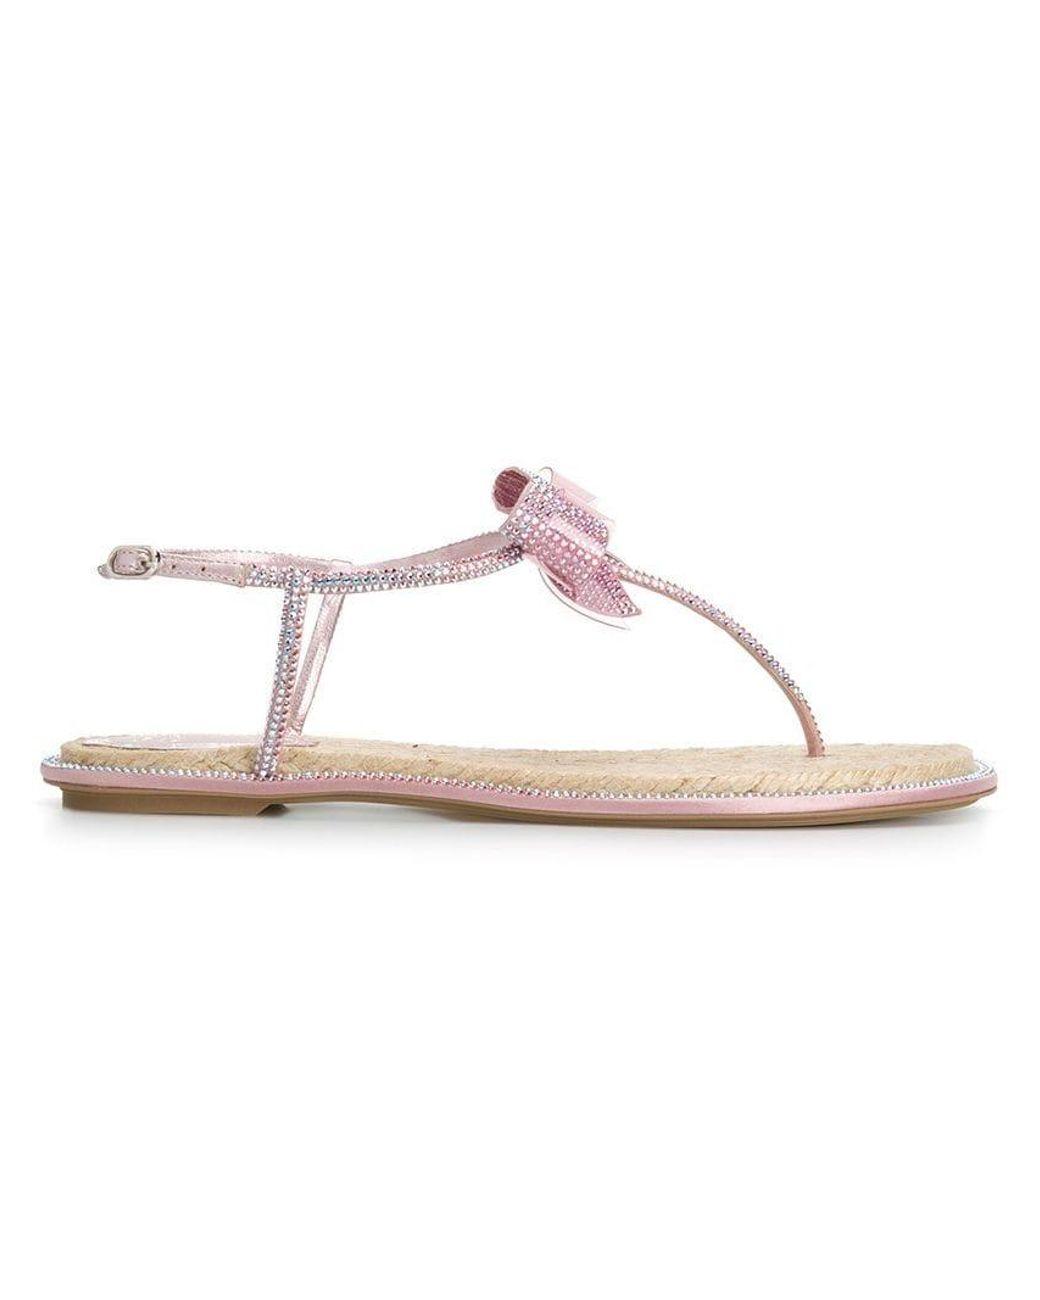 48e2002eb48 Lyst - Rene Caovilla Catavina Flat Sandals in Pink